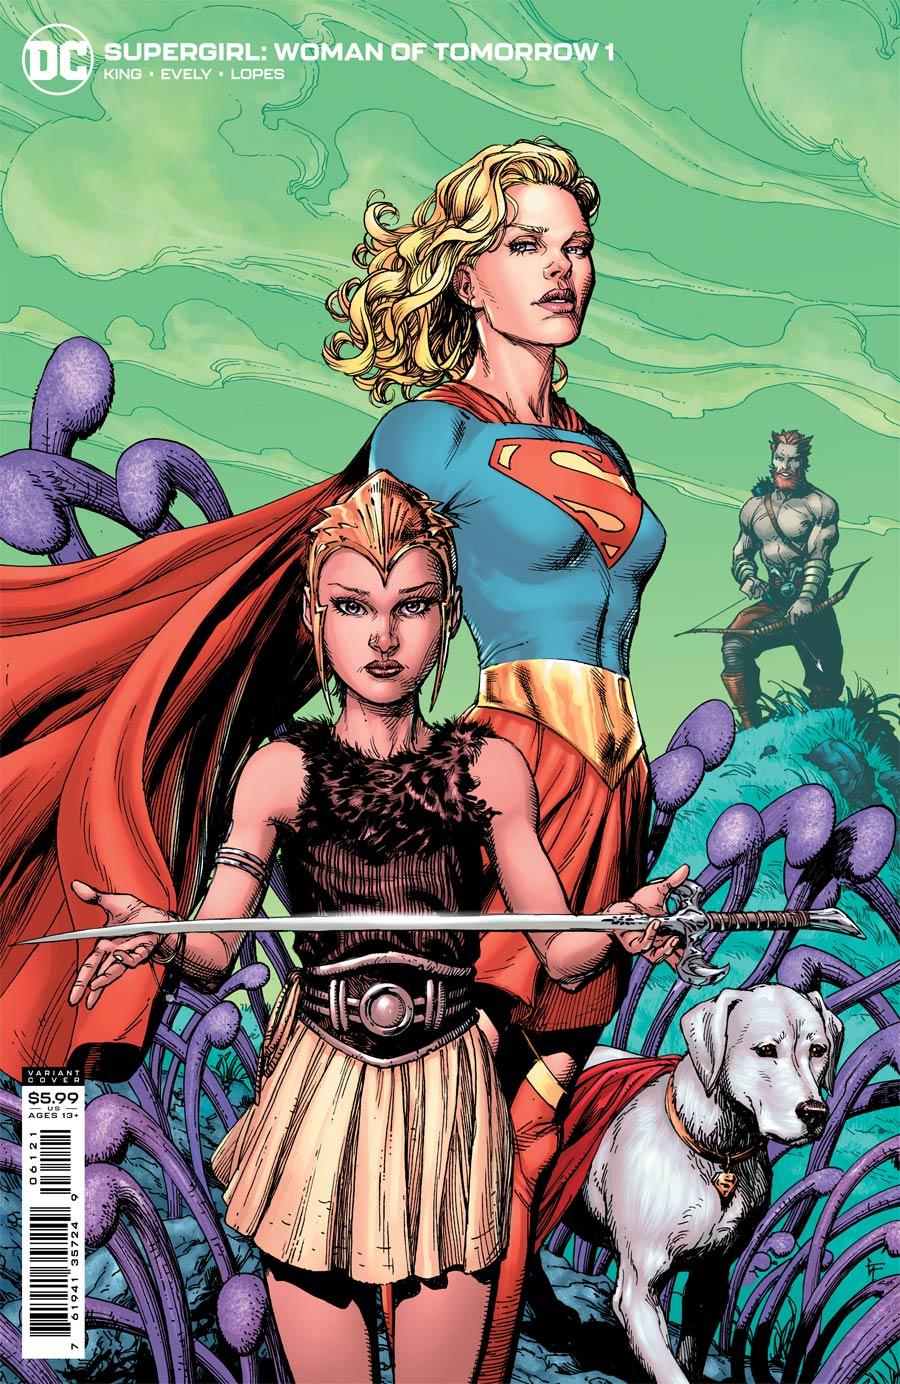 08-SupergirlWOT01b